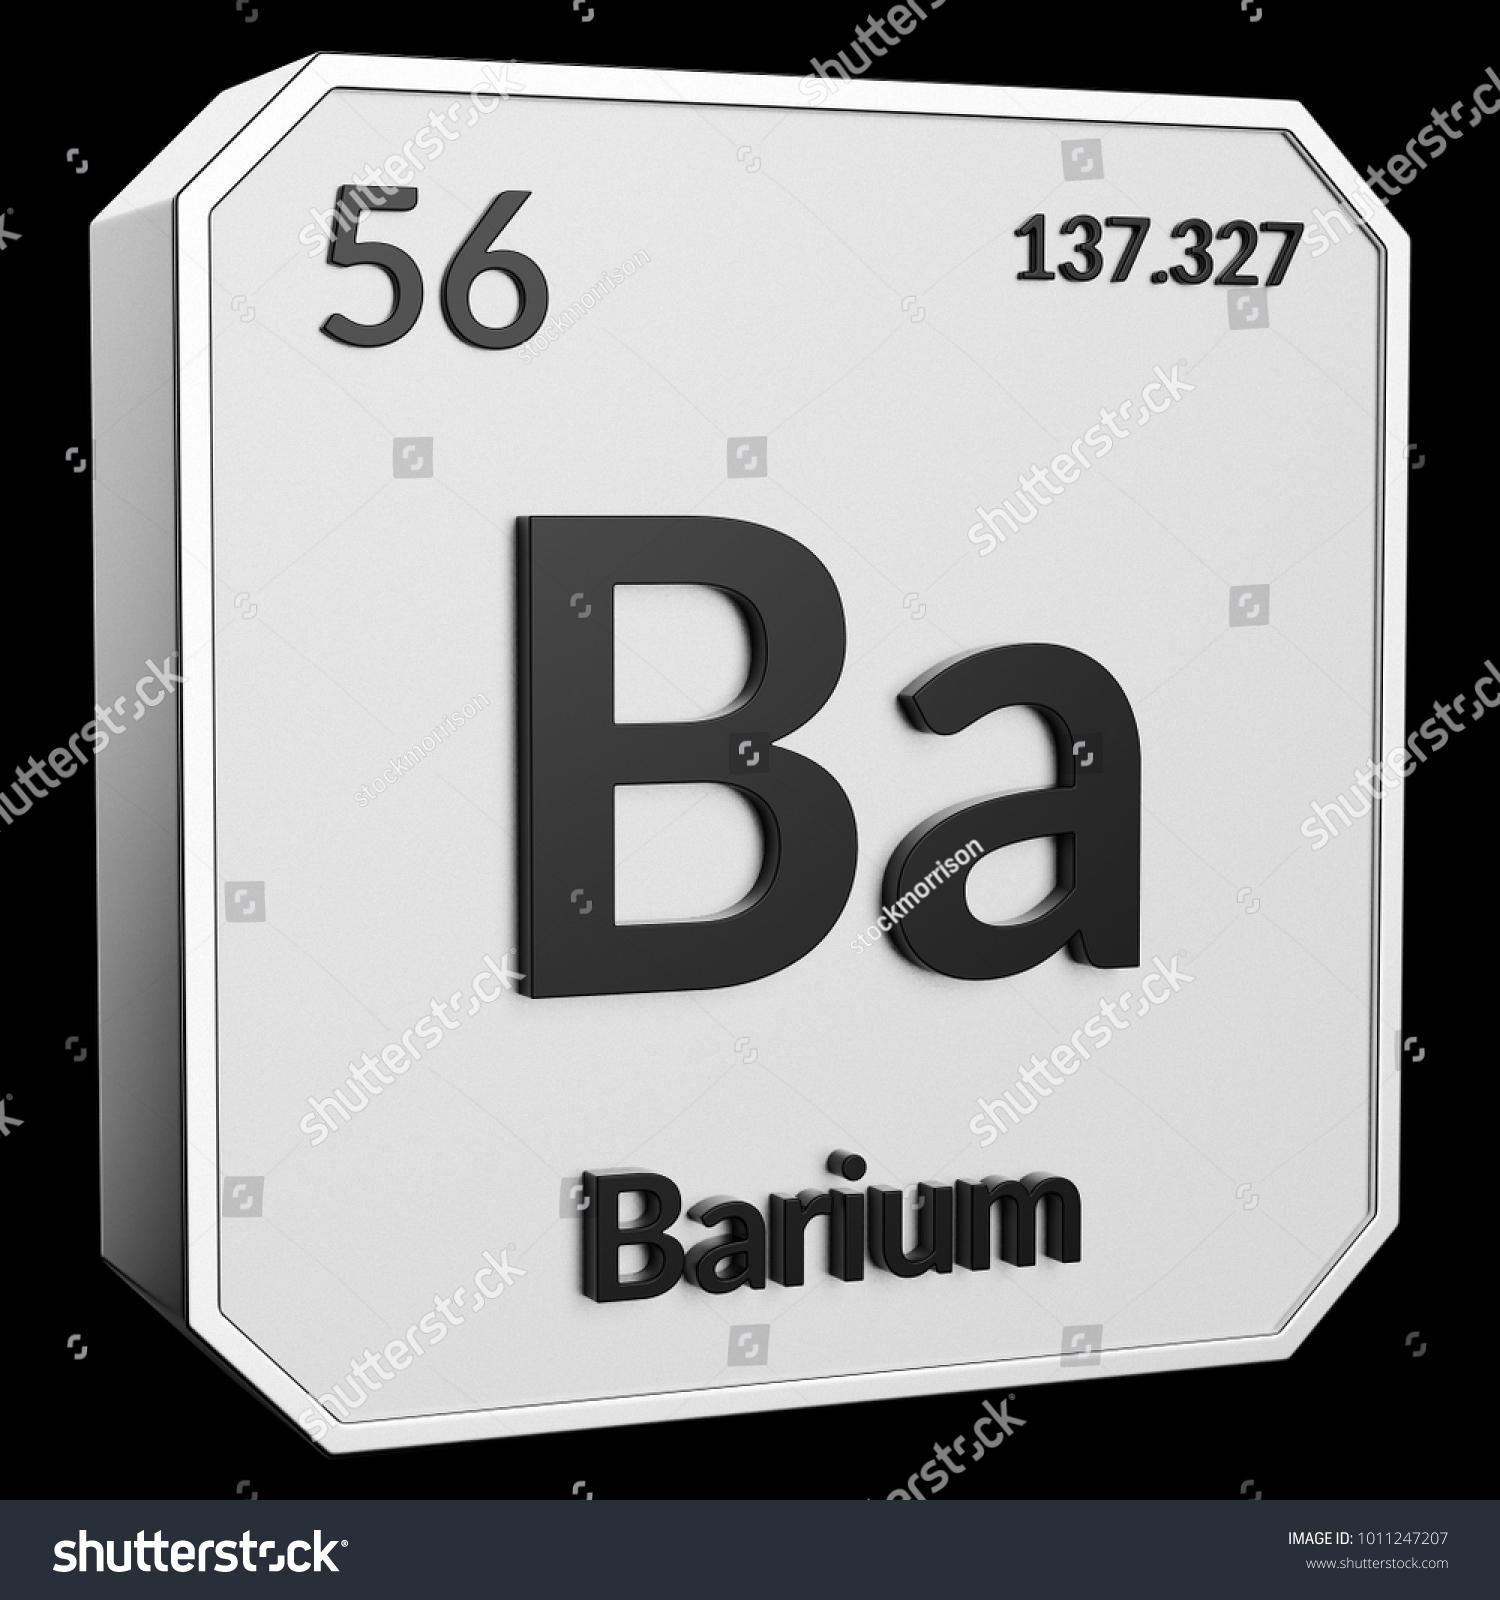 The namesake symbols image collections symbol and sign ideas chemical symbol of barium choice image symbol and sign ideas 3d text chemical element barium atomic buycottarizona